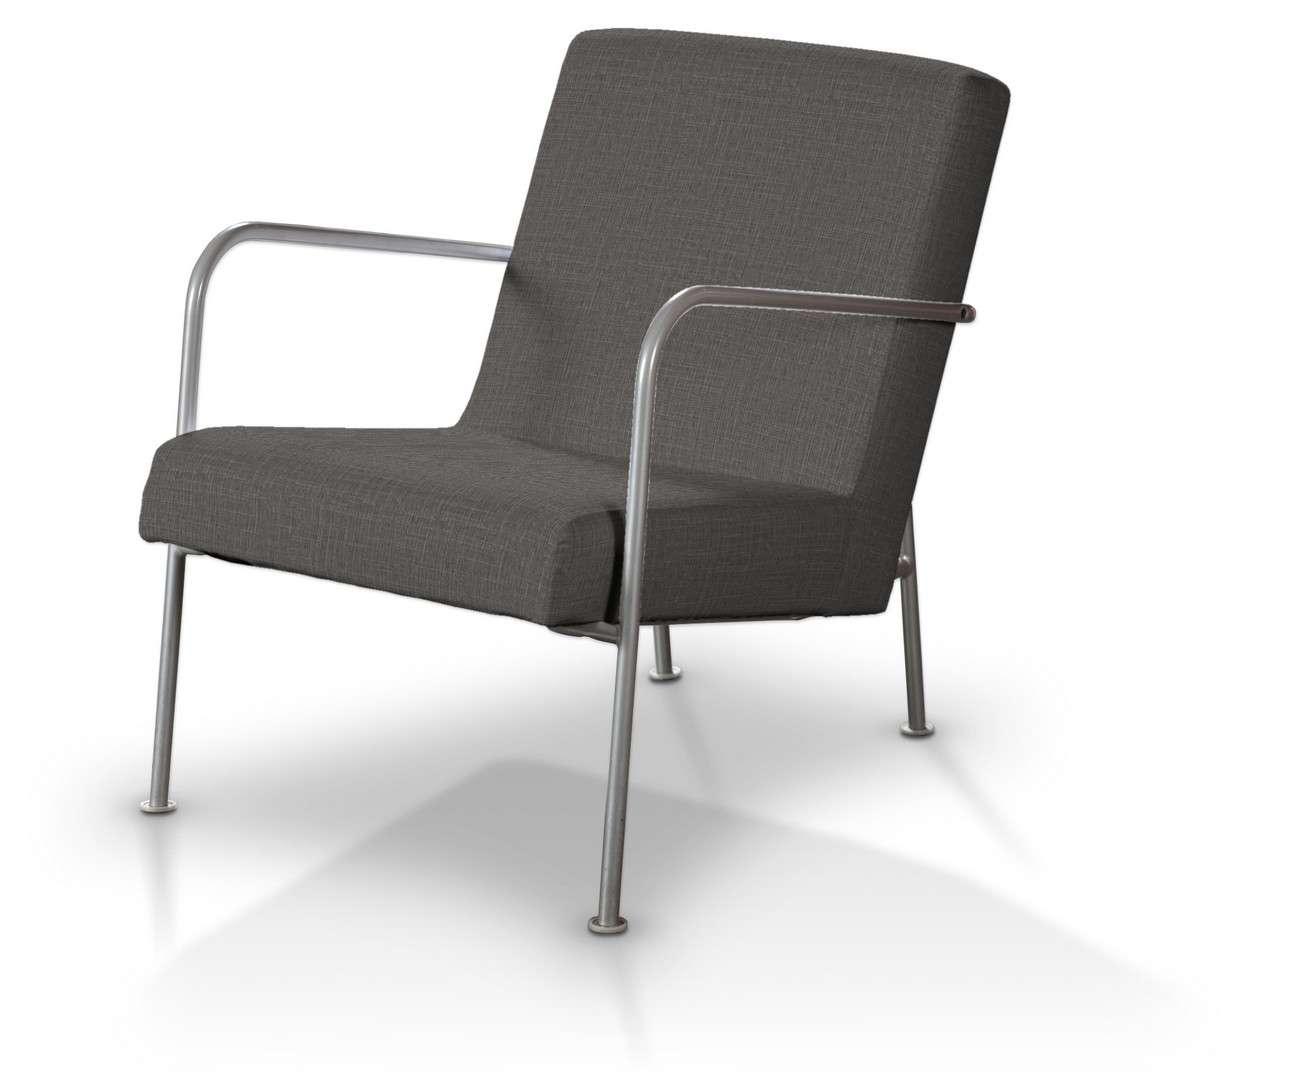 Ikea PS Sesselbezug von der Kollektion Living, Stoff: 161-16